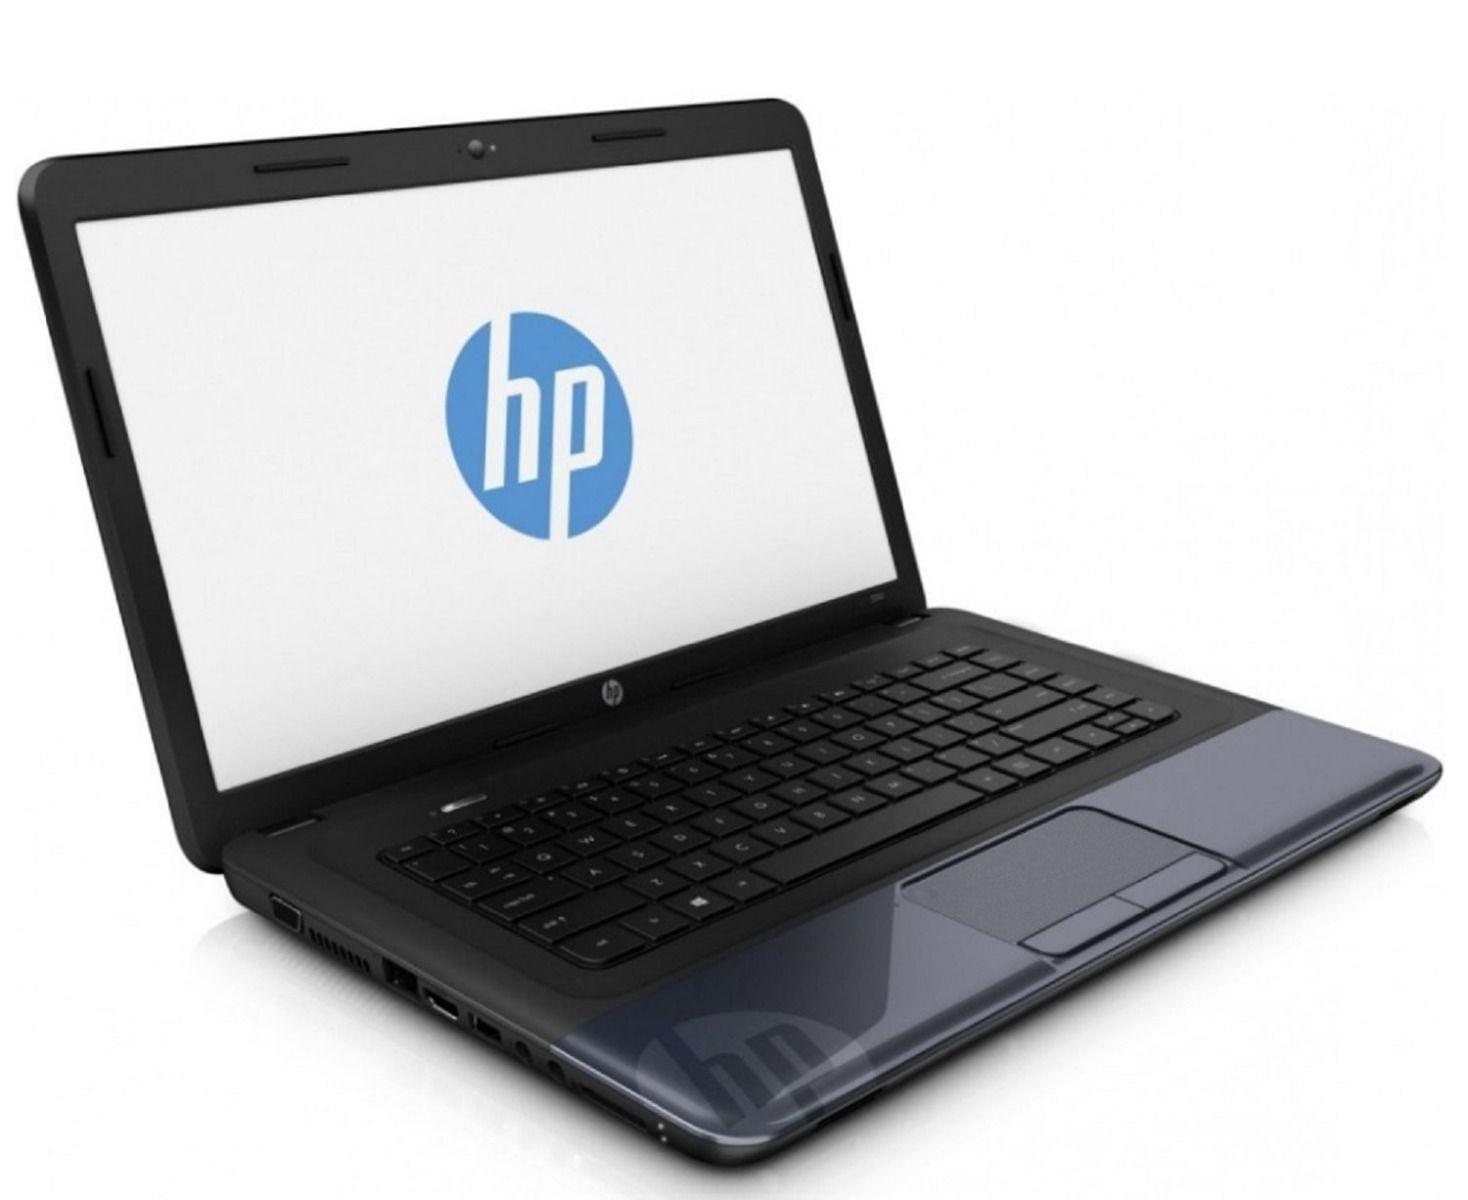 HP 2000-412NR AMD HD GRAPHICS 64BIT DRIVER